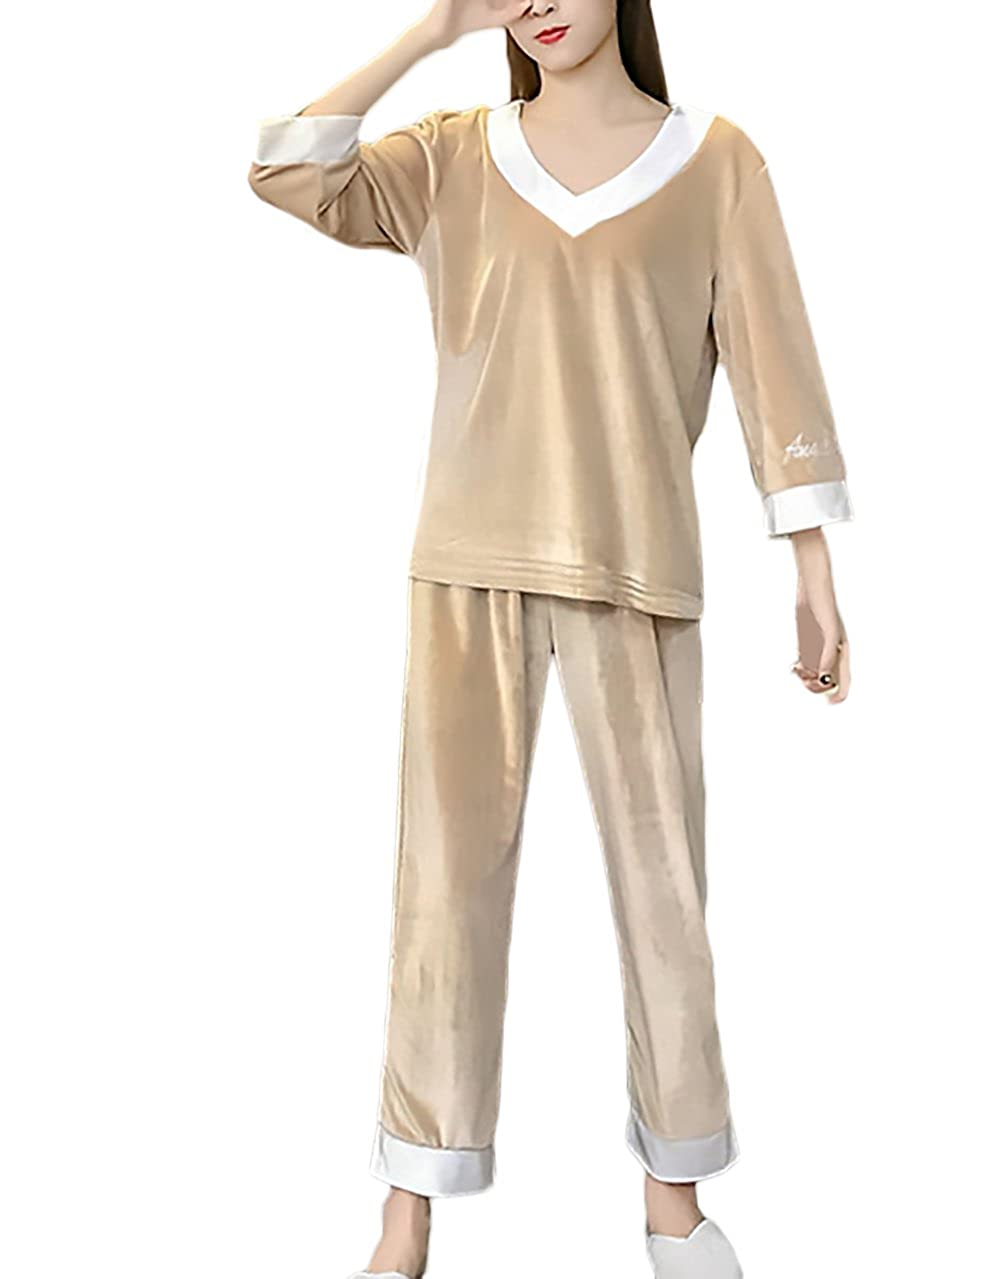 Pijamas Mujer Tops + Pantalones 2 Piezas Conjunto Elegantes Otoño Joven Bastante Invierno Manga Larga V Cuello Anchas Casual Velours Camisones Women: ...